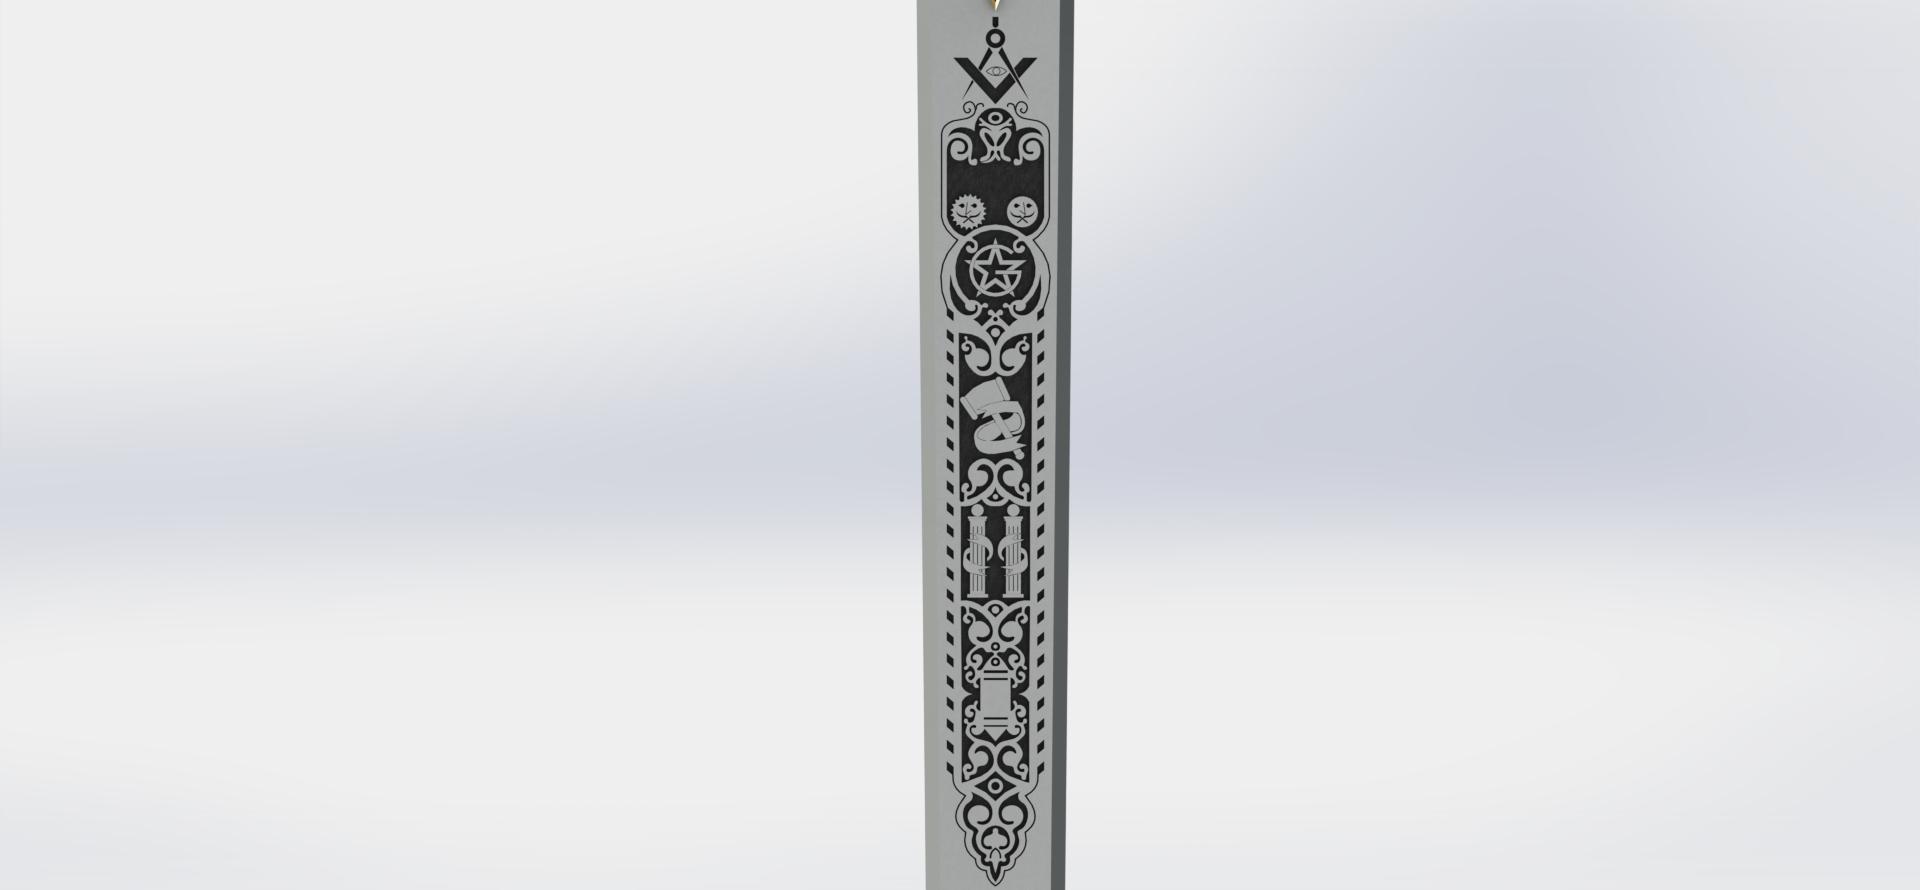 preview15.JPG Download STL file Masonic Ceremony Sword-Ready 3D Print • 3D printable template, GokBoru